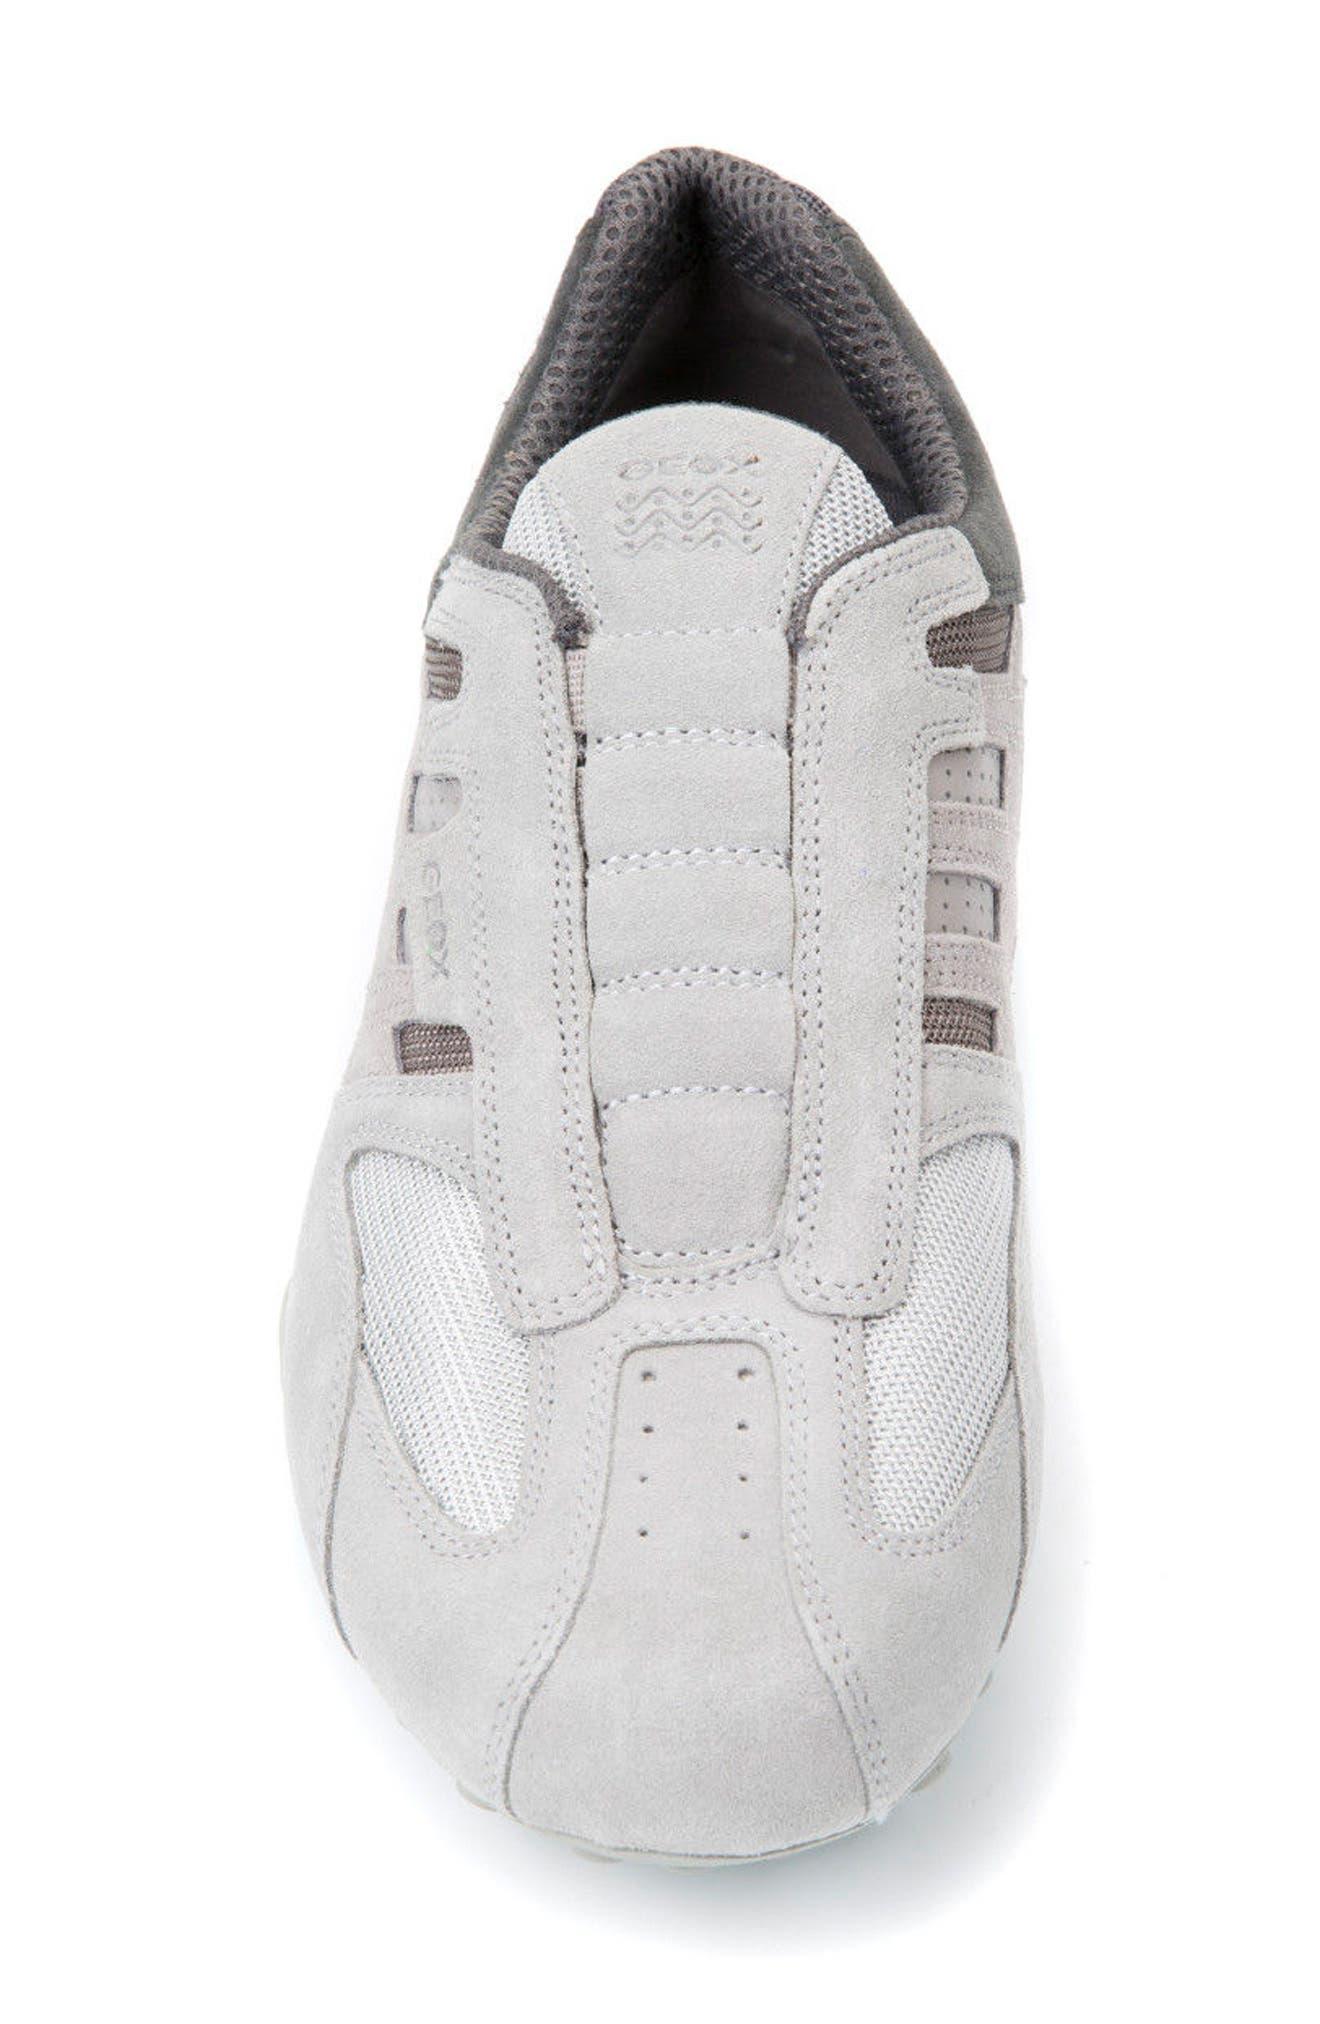 Snake 126 Laceless Low Top Sneaker,                             Alternate thumbnail 4, color,                             050